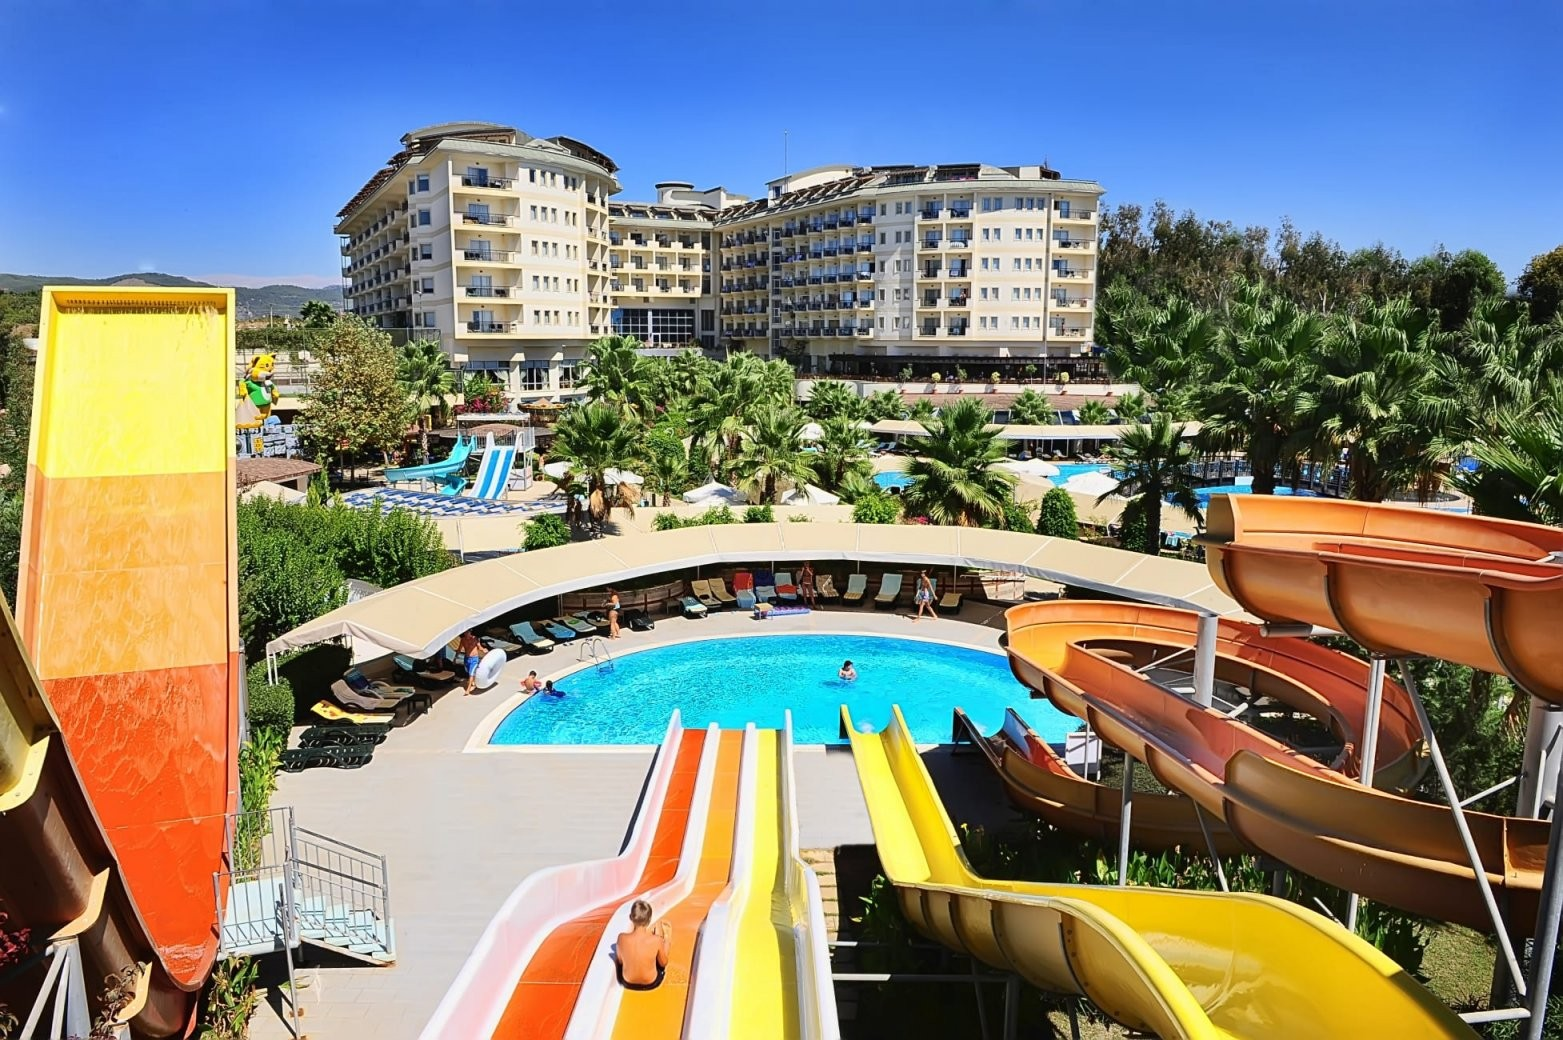 Resort Hotel Mukarnas Spa Resort Okurcalar  Trivago von Vikingen Infinity Resort & Spa Bewertung Photo